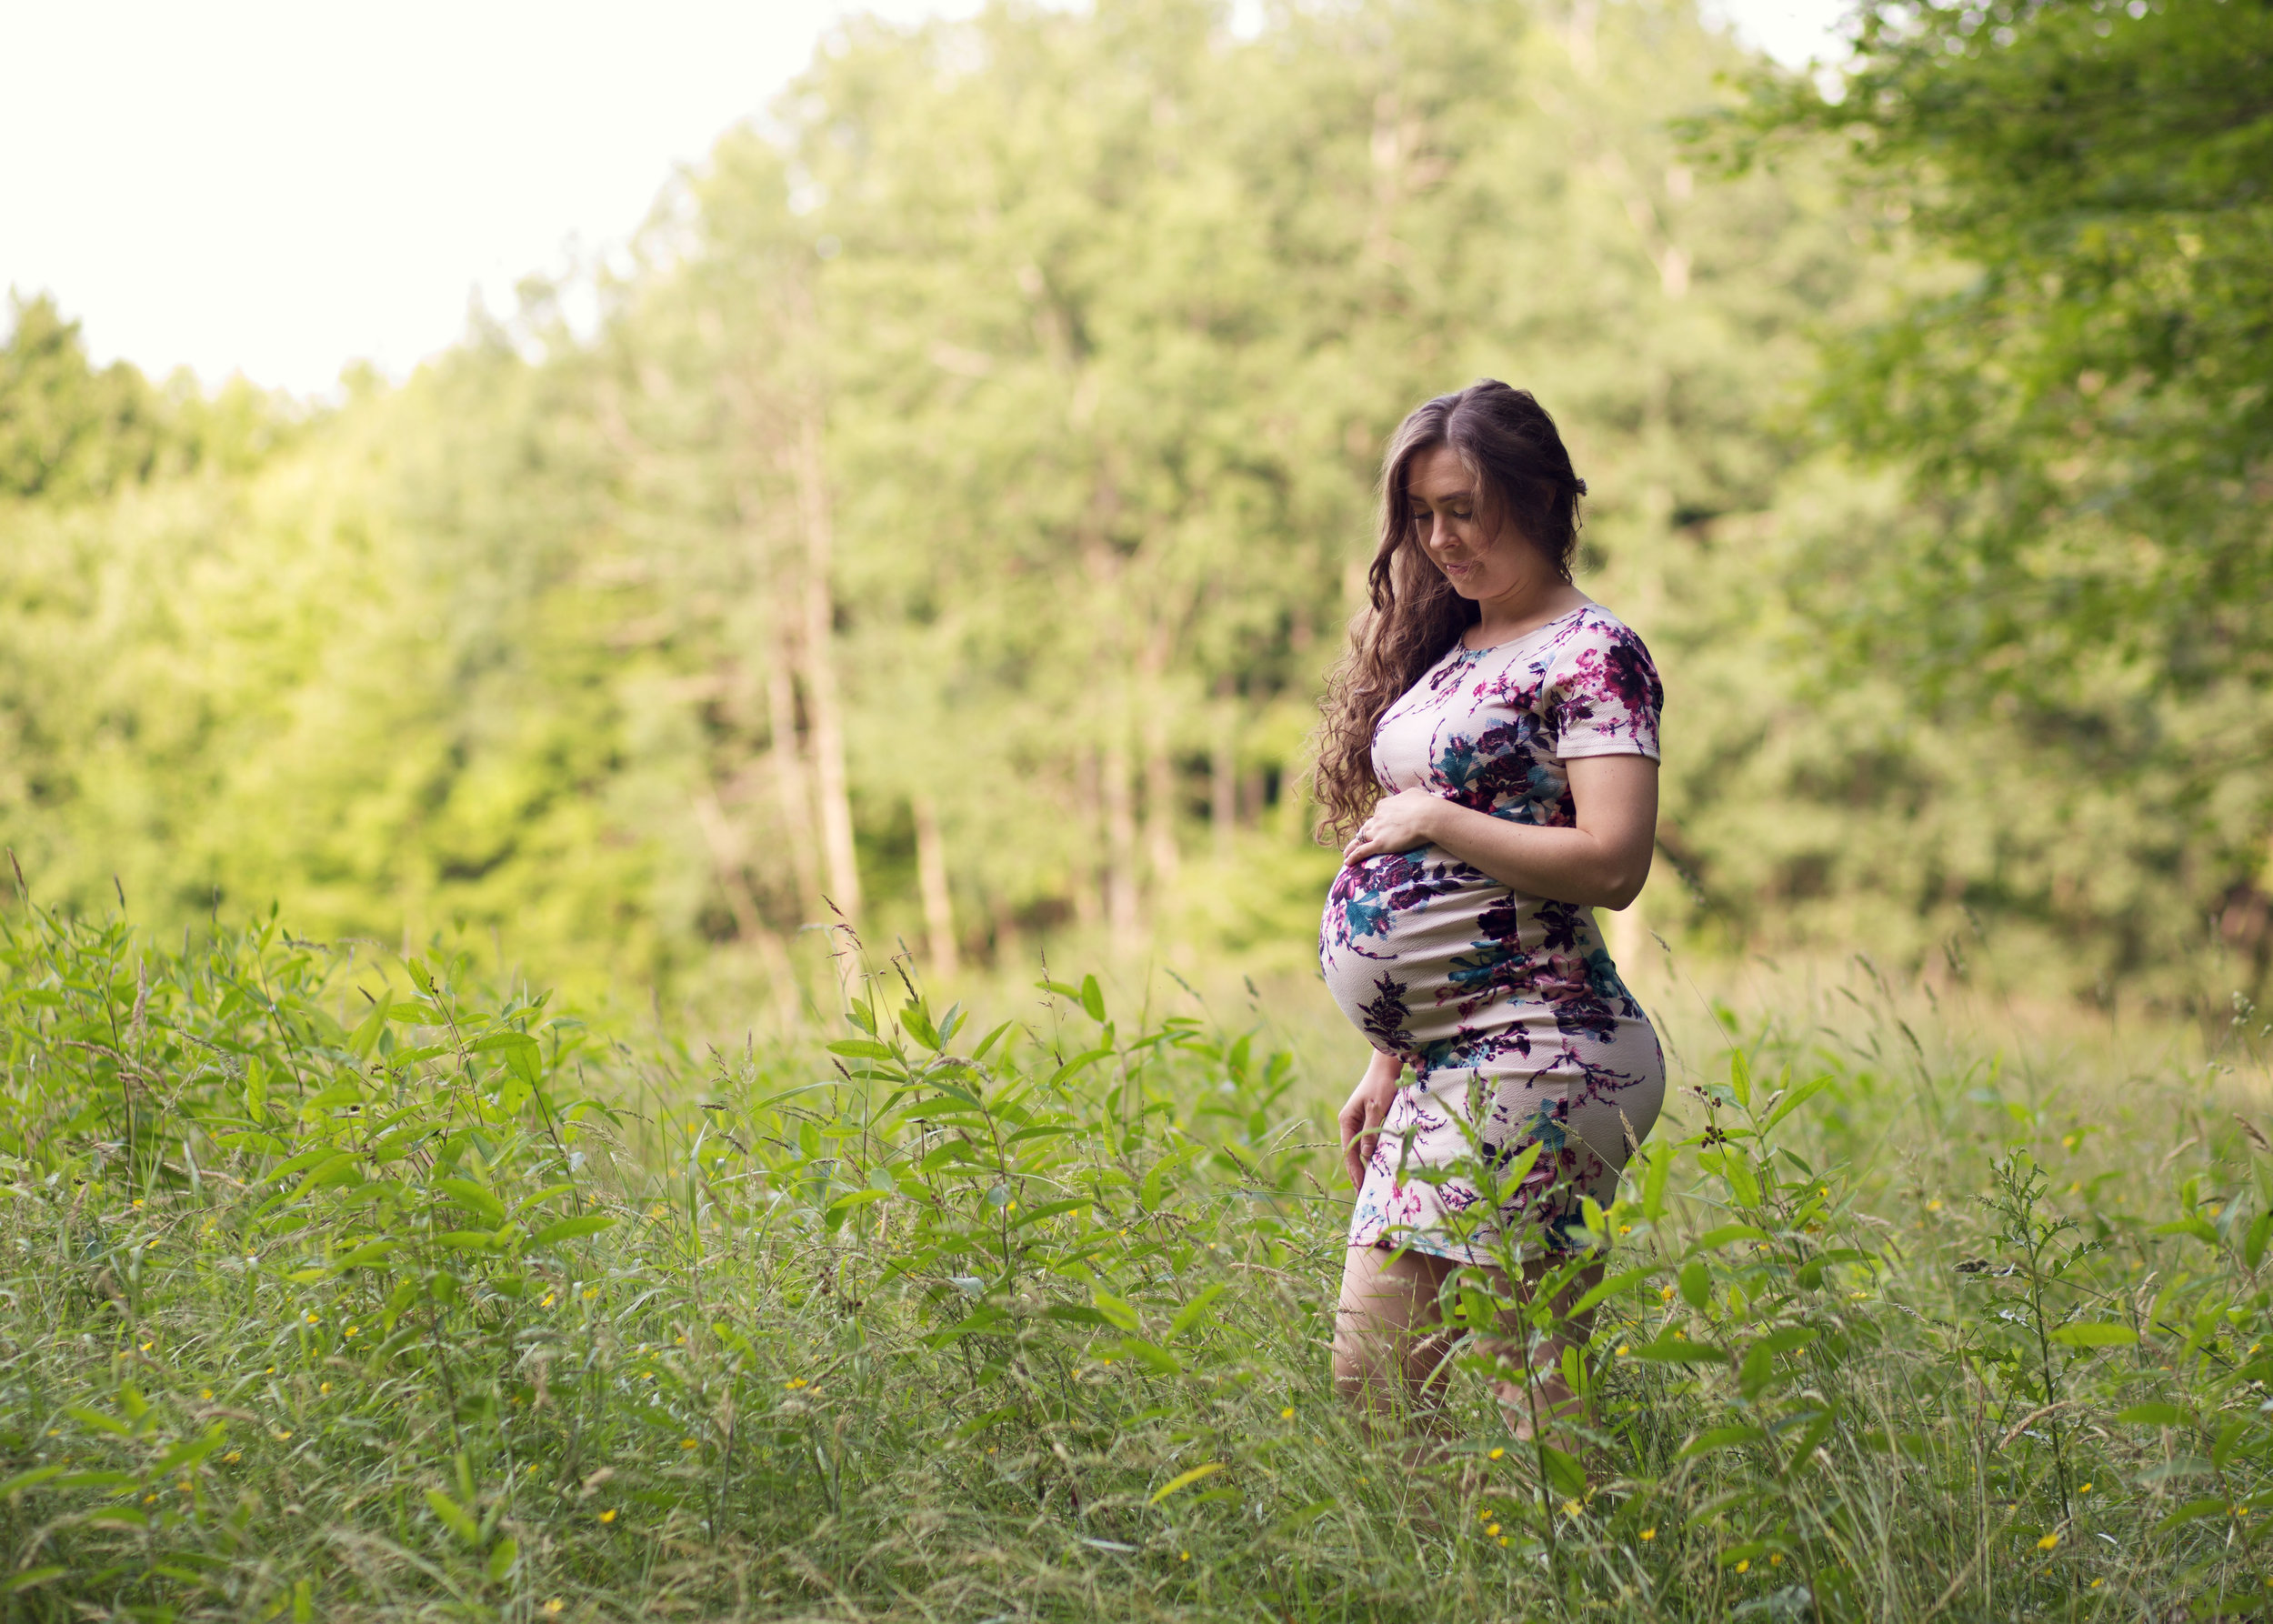 Lifestyle Maternity Session | Kelly Rhoades Photography